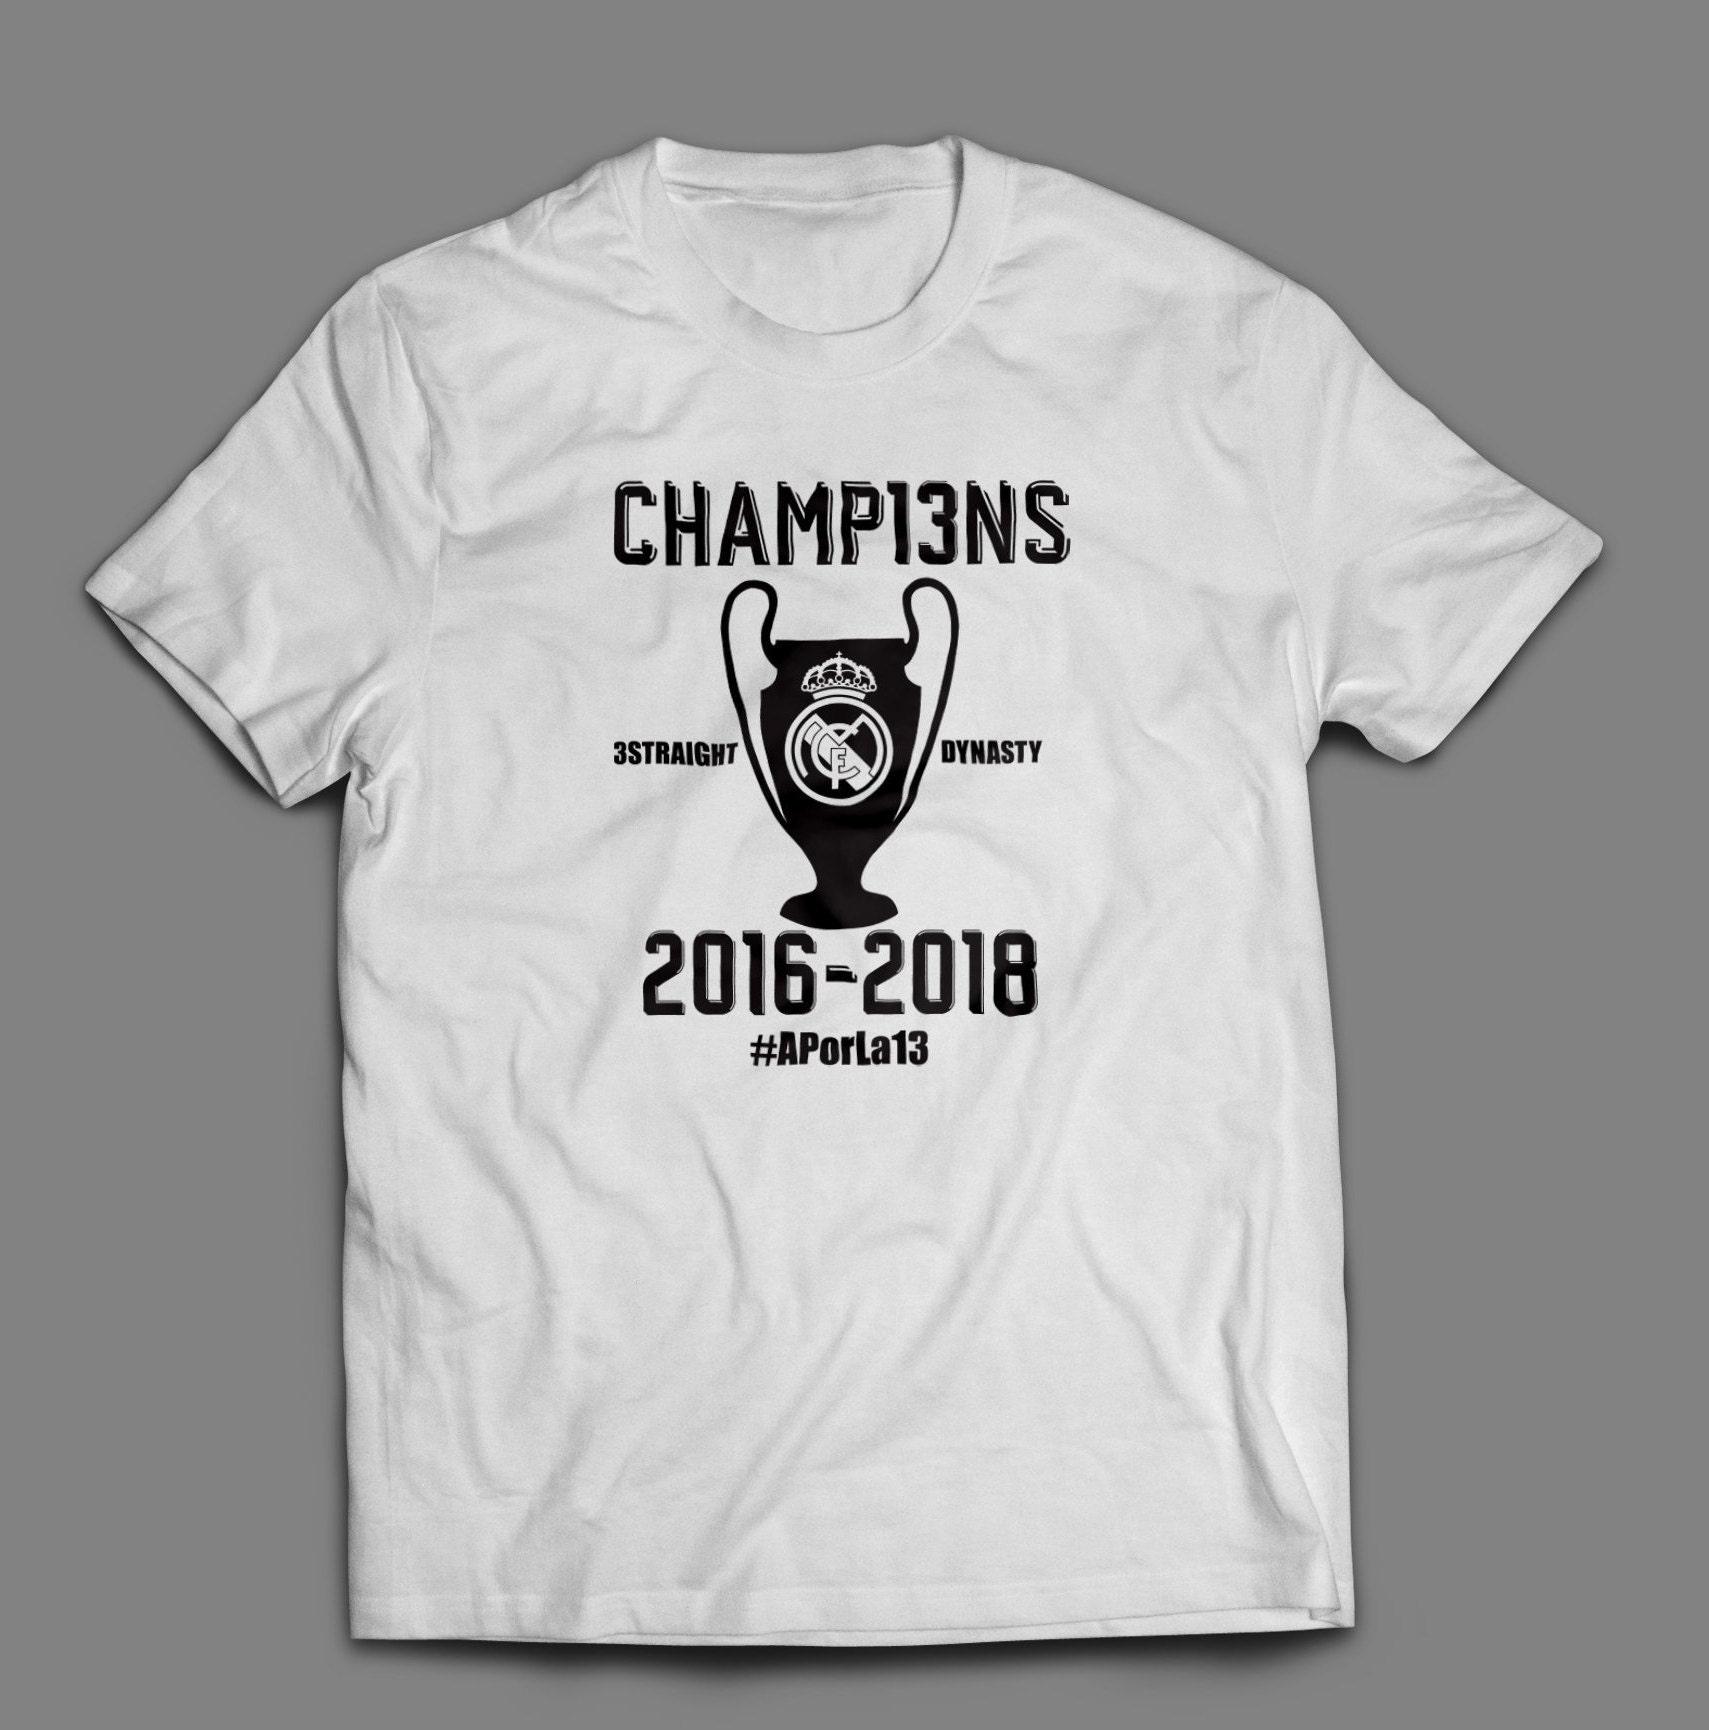 3d22efb2f Real Madrid Champions League 2016-2018 Shirt #APorLa13 S-4XL ...